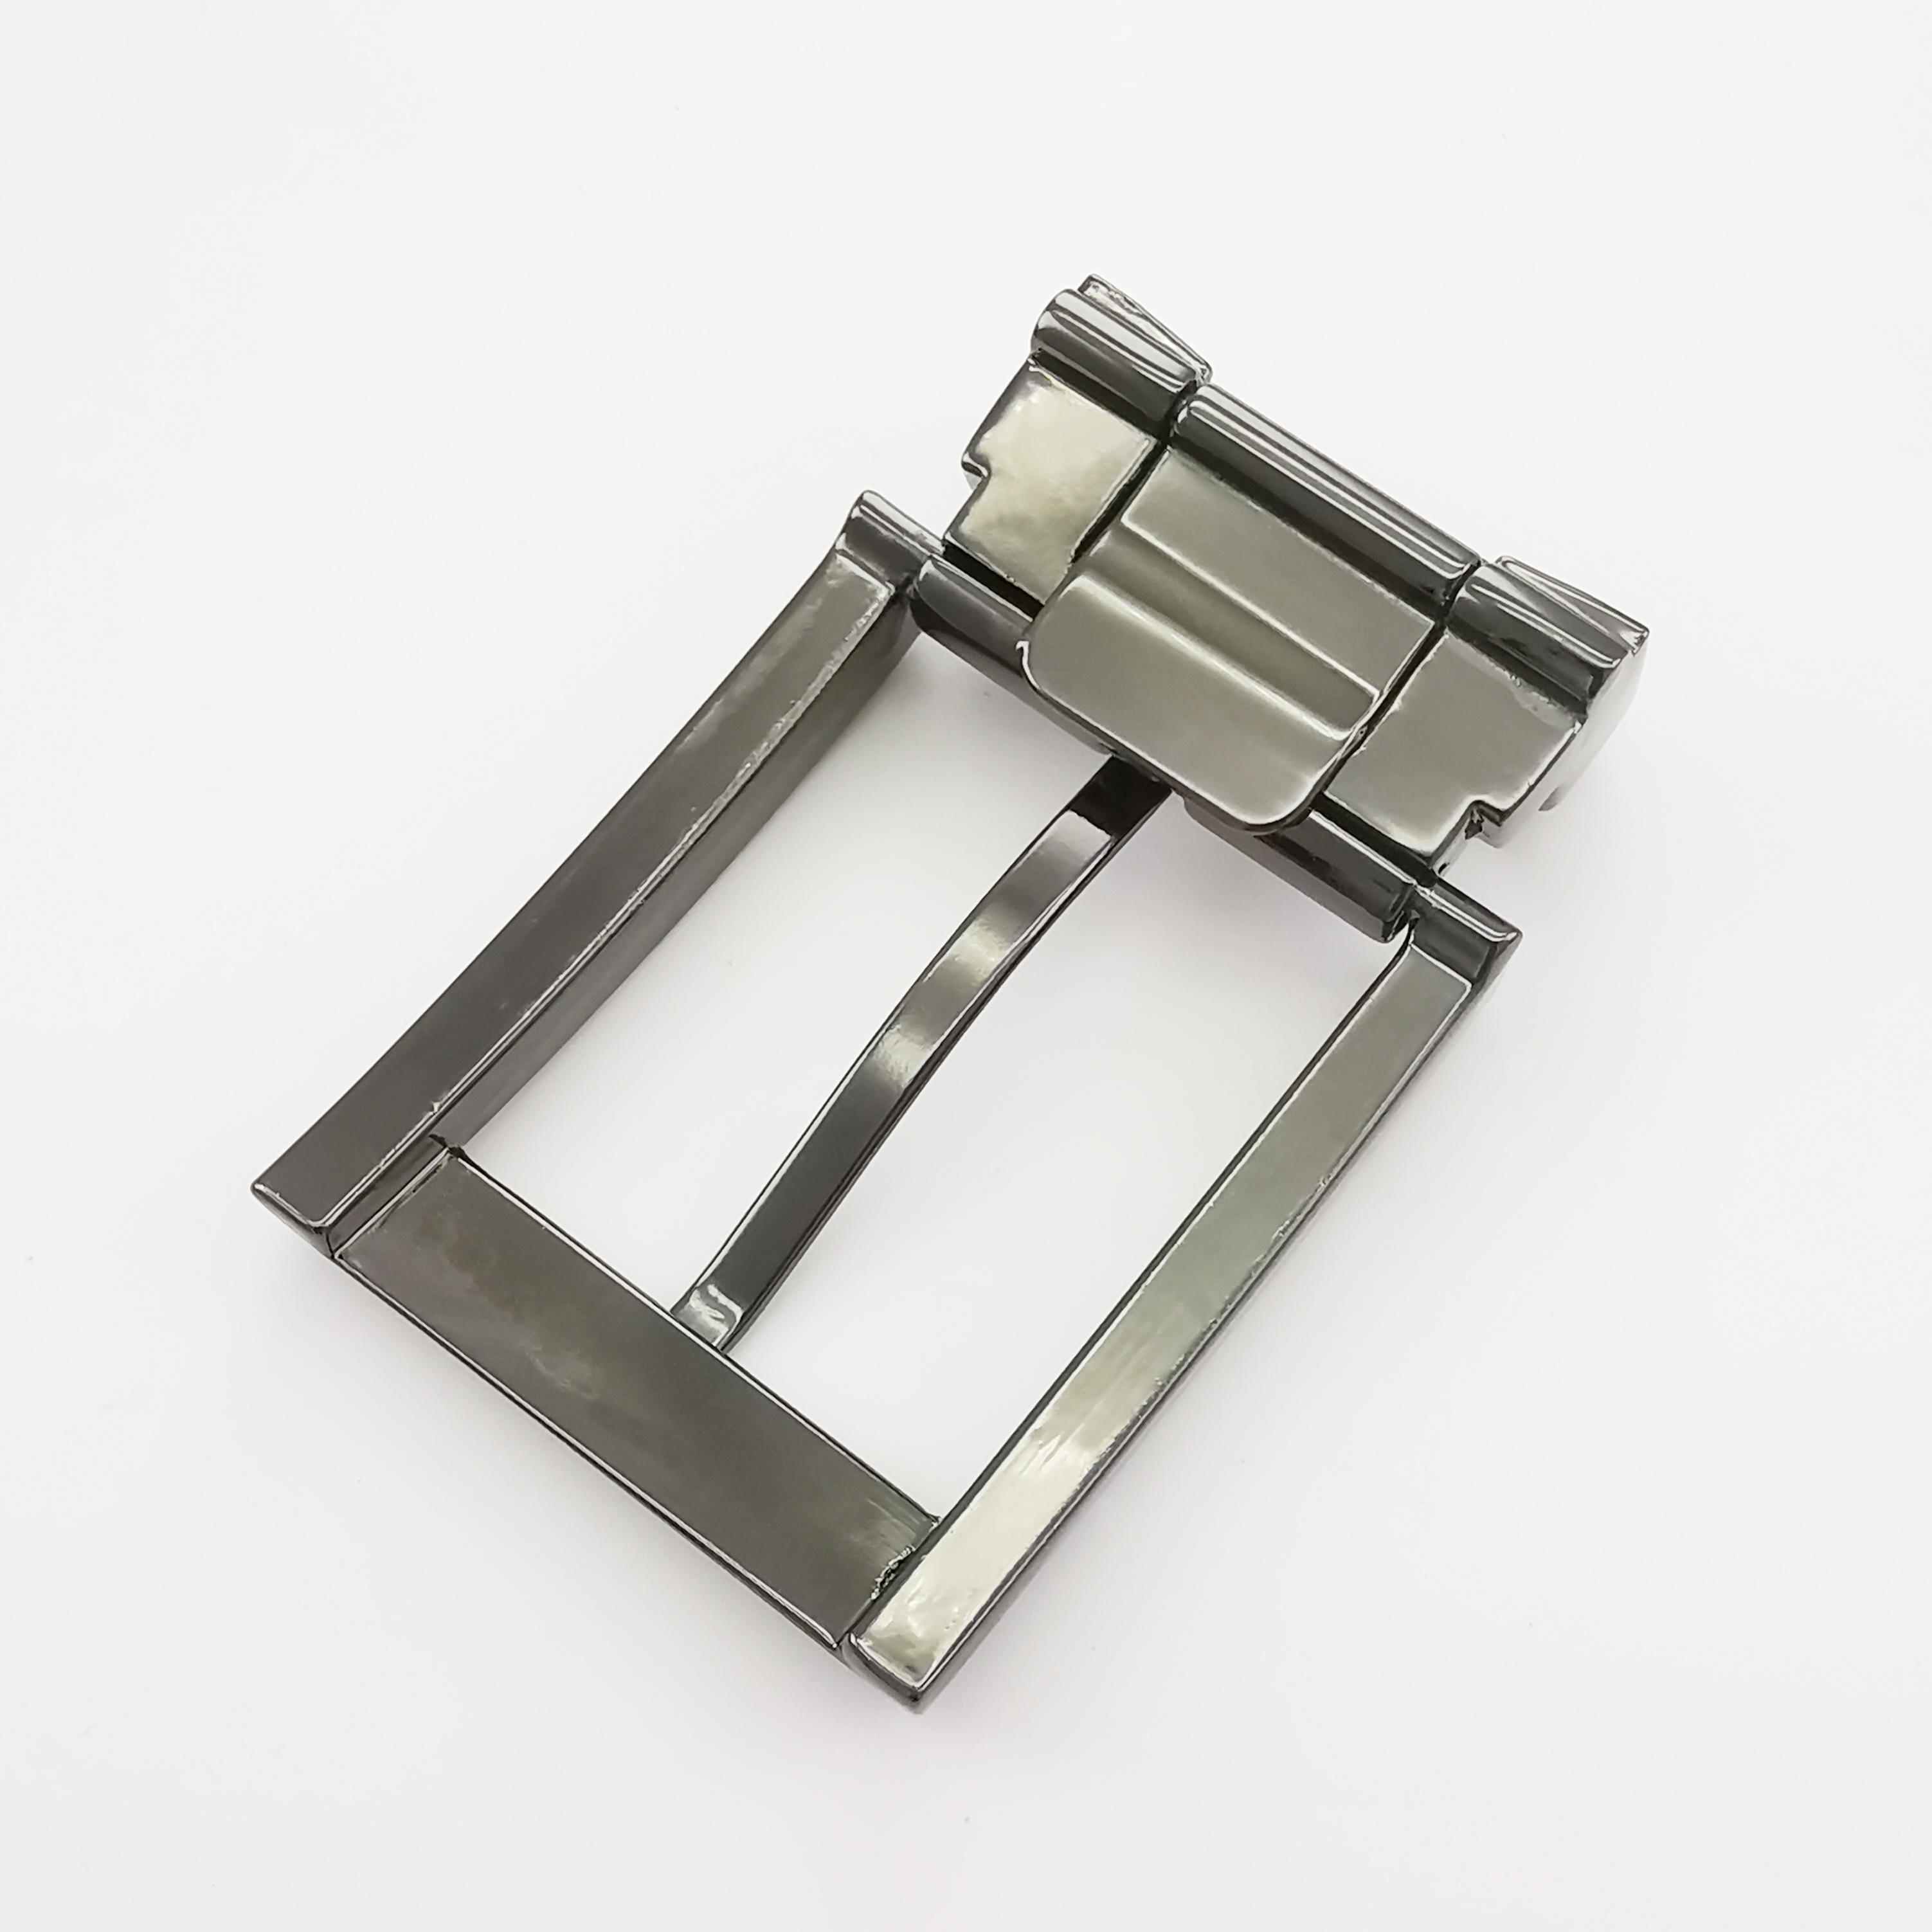 Hot Sale Latest Hot Selling New Fashion Wholesale belt buckle custom logo